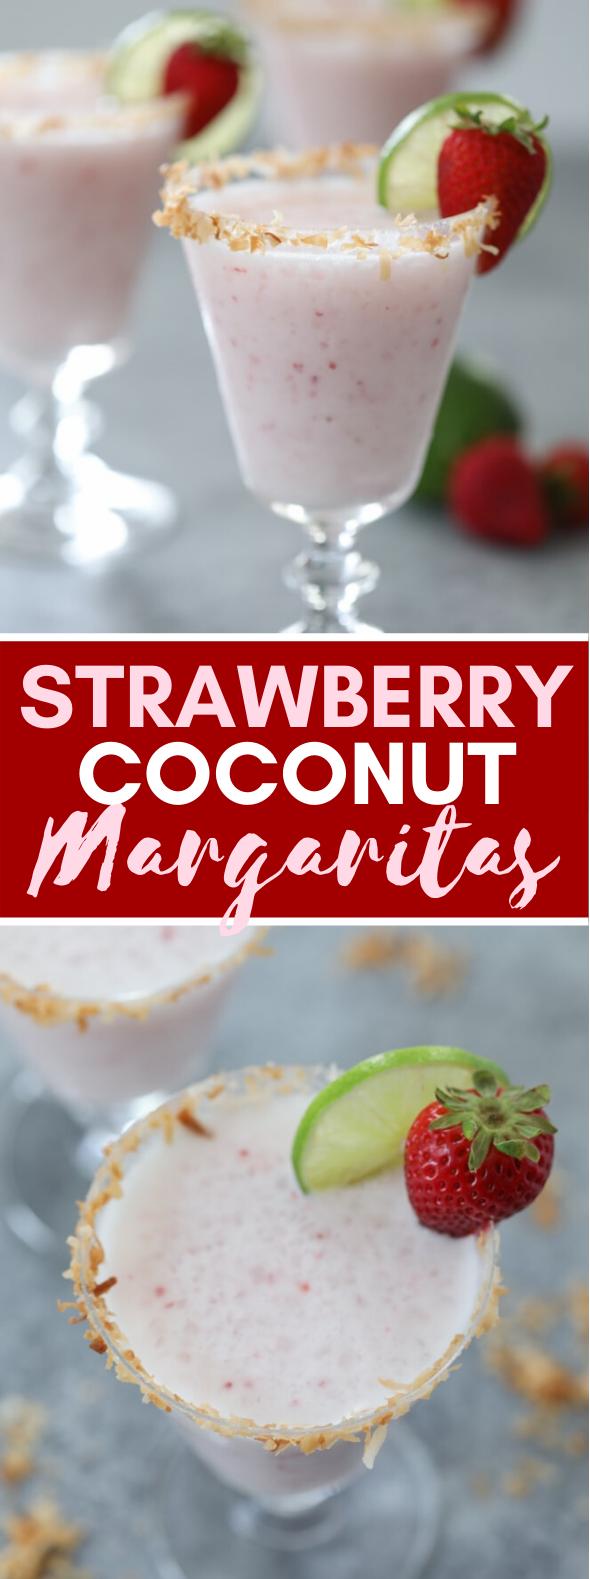 STRAWBERRY COCONUT MARGARITAS #drinks #smoothie